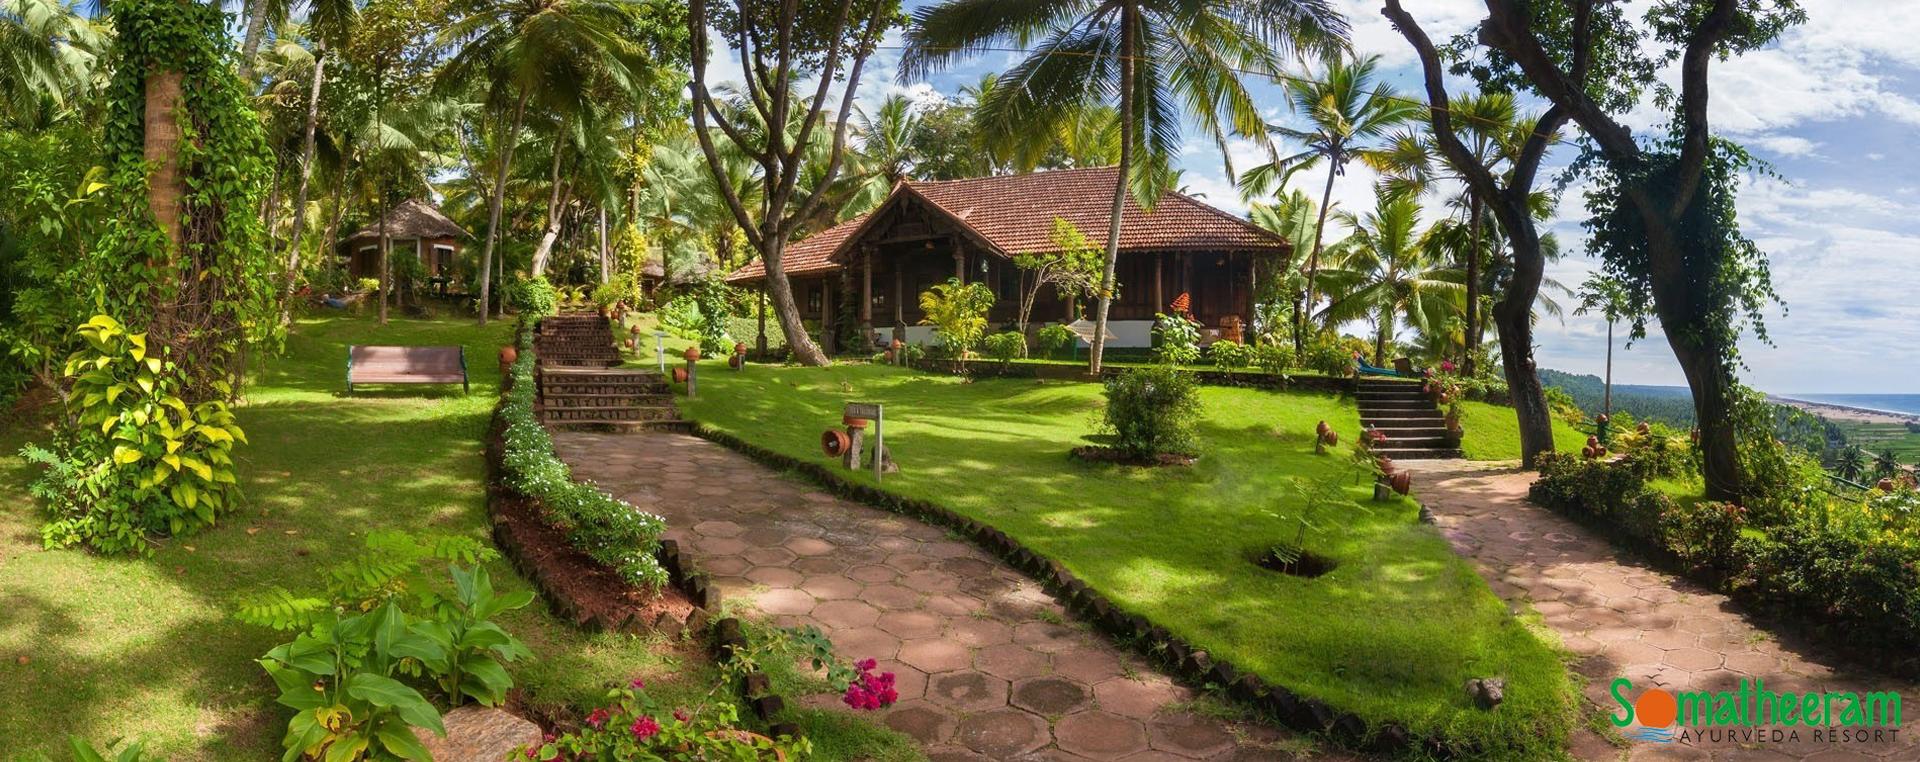 Best Ayurveda Hospital With Resort Ambiance Kerala